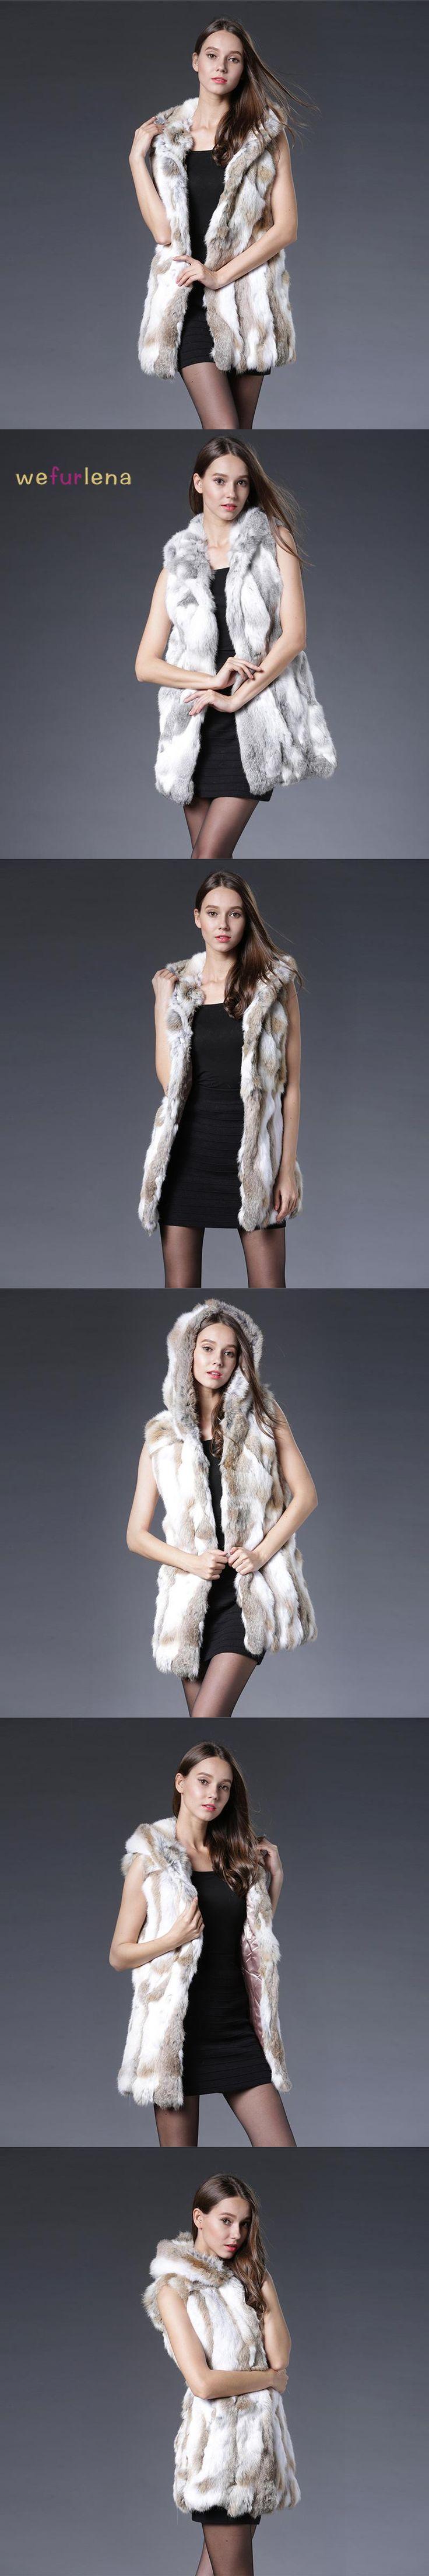 2017 New Genuine Rex Rabbit Fur Vest With Hooded Real Silm Rabbit Fur Waistcoats Winter Rabbit Fur Jacket Plus Size S-3XL